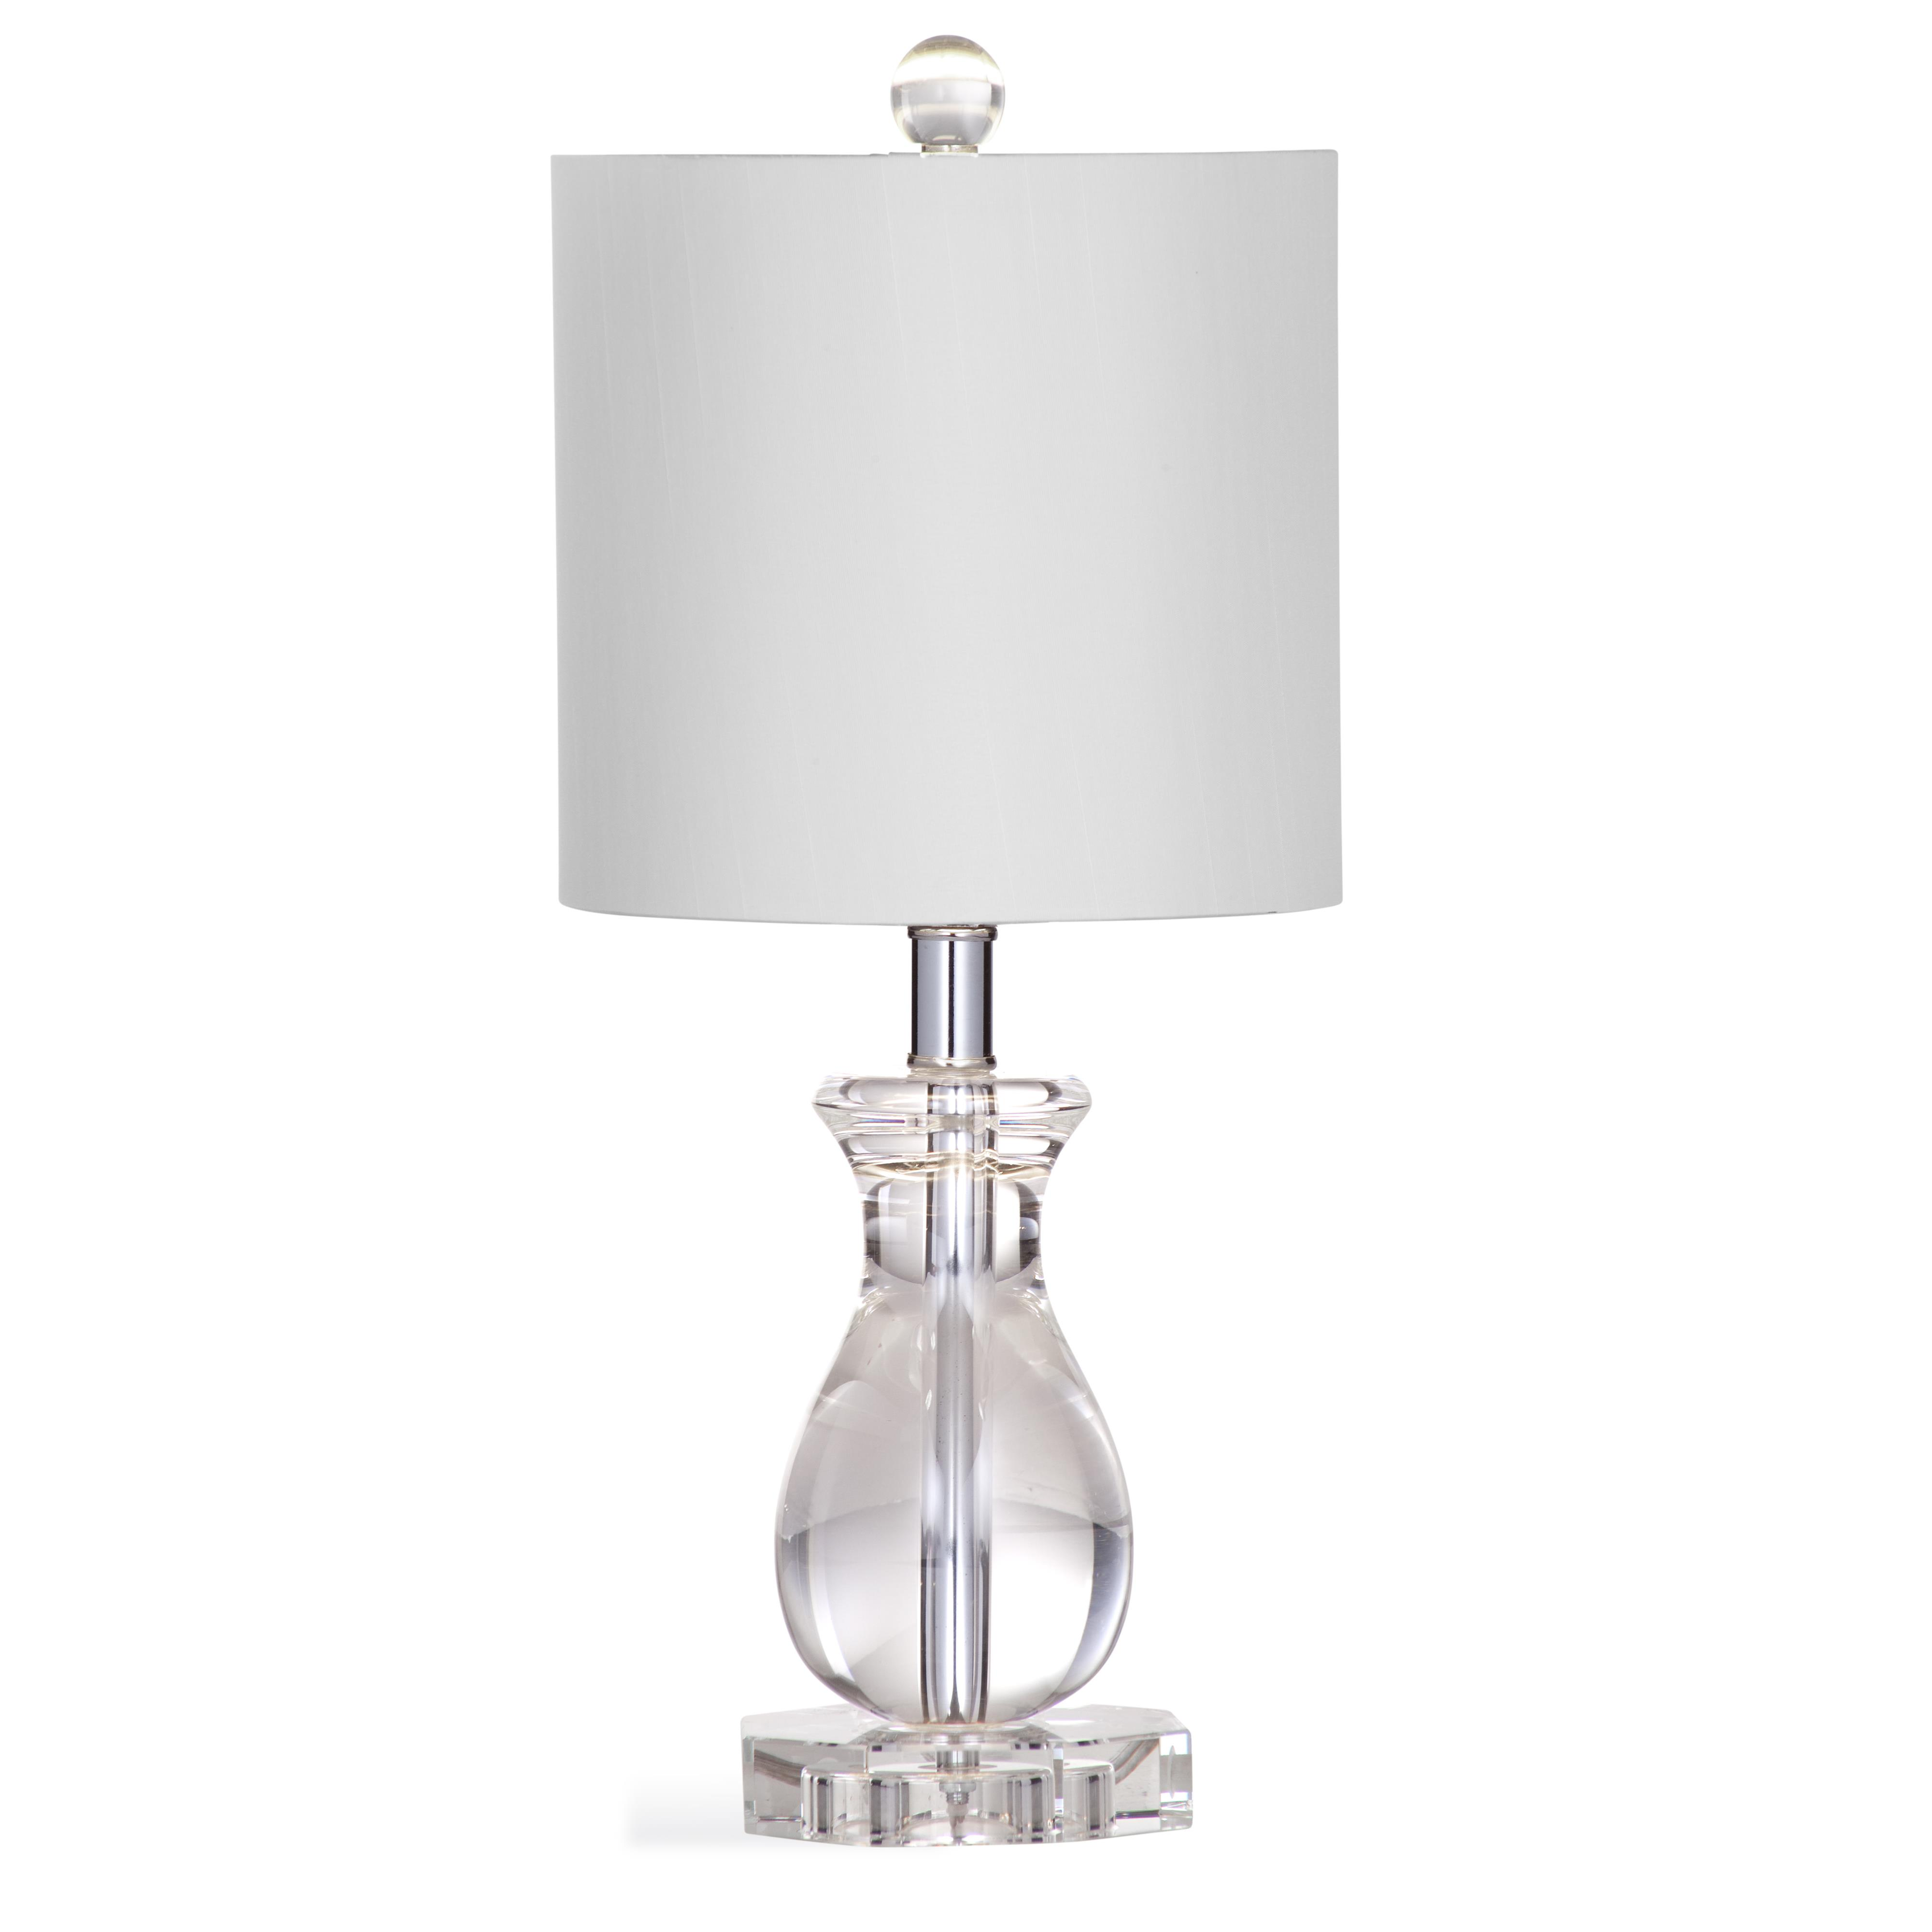 Leona Table Lamp